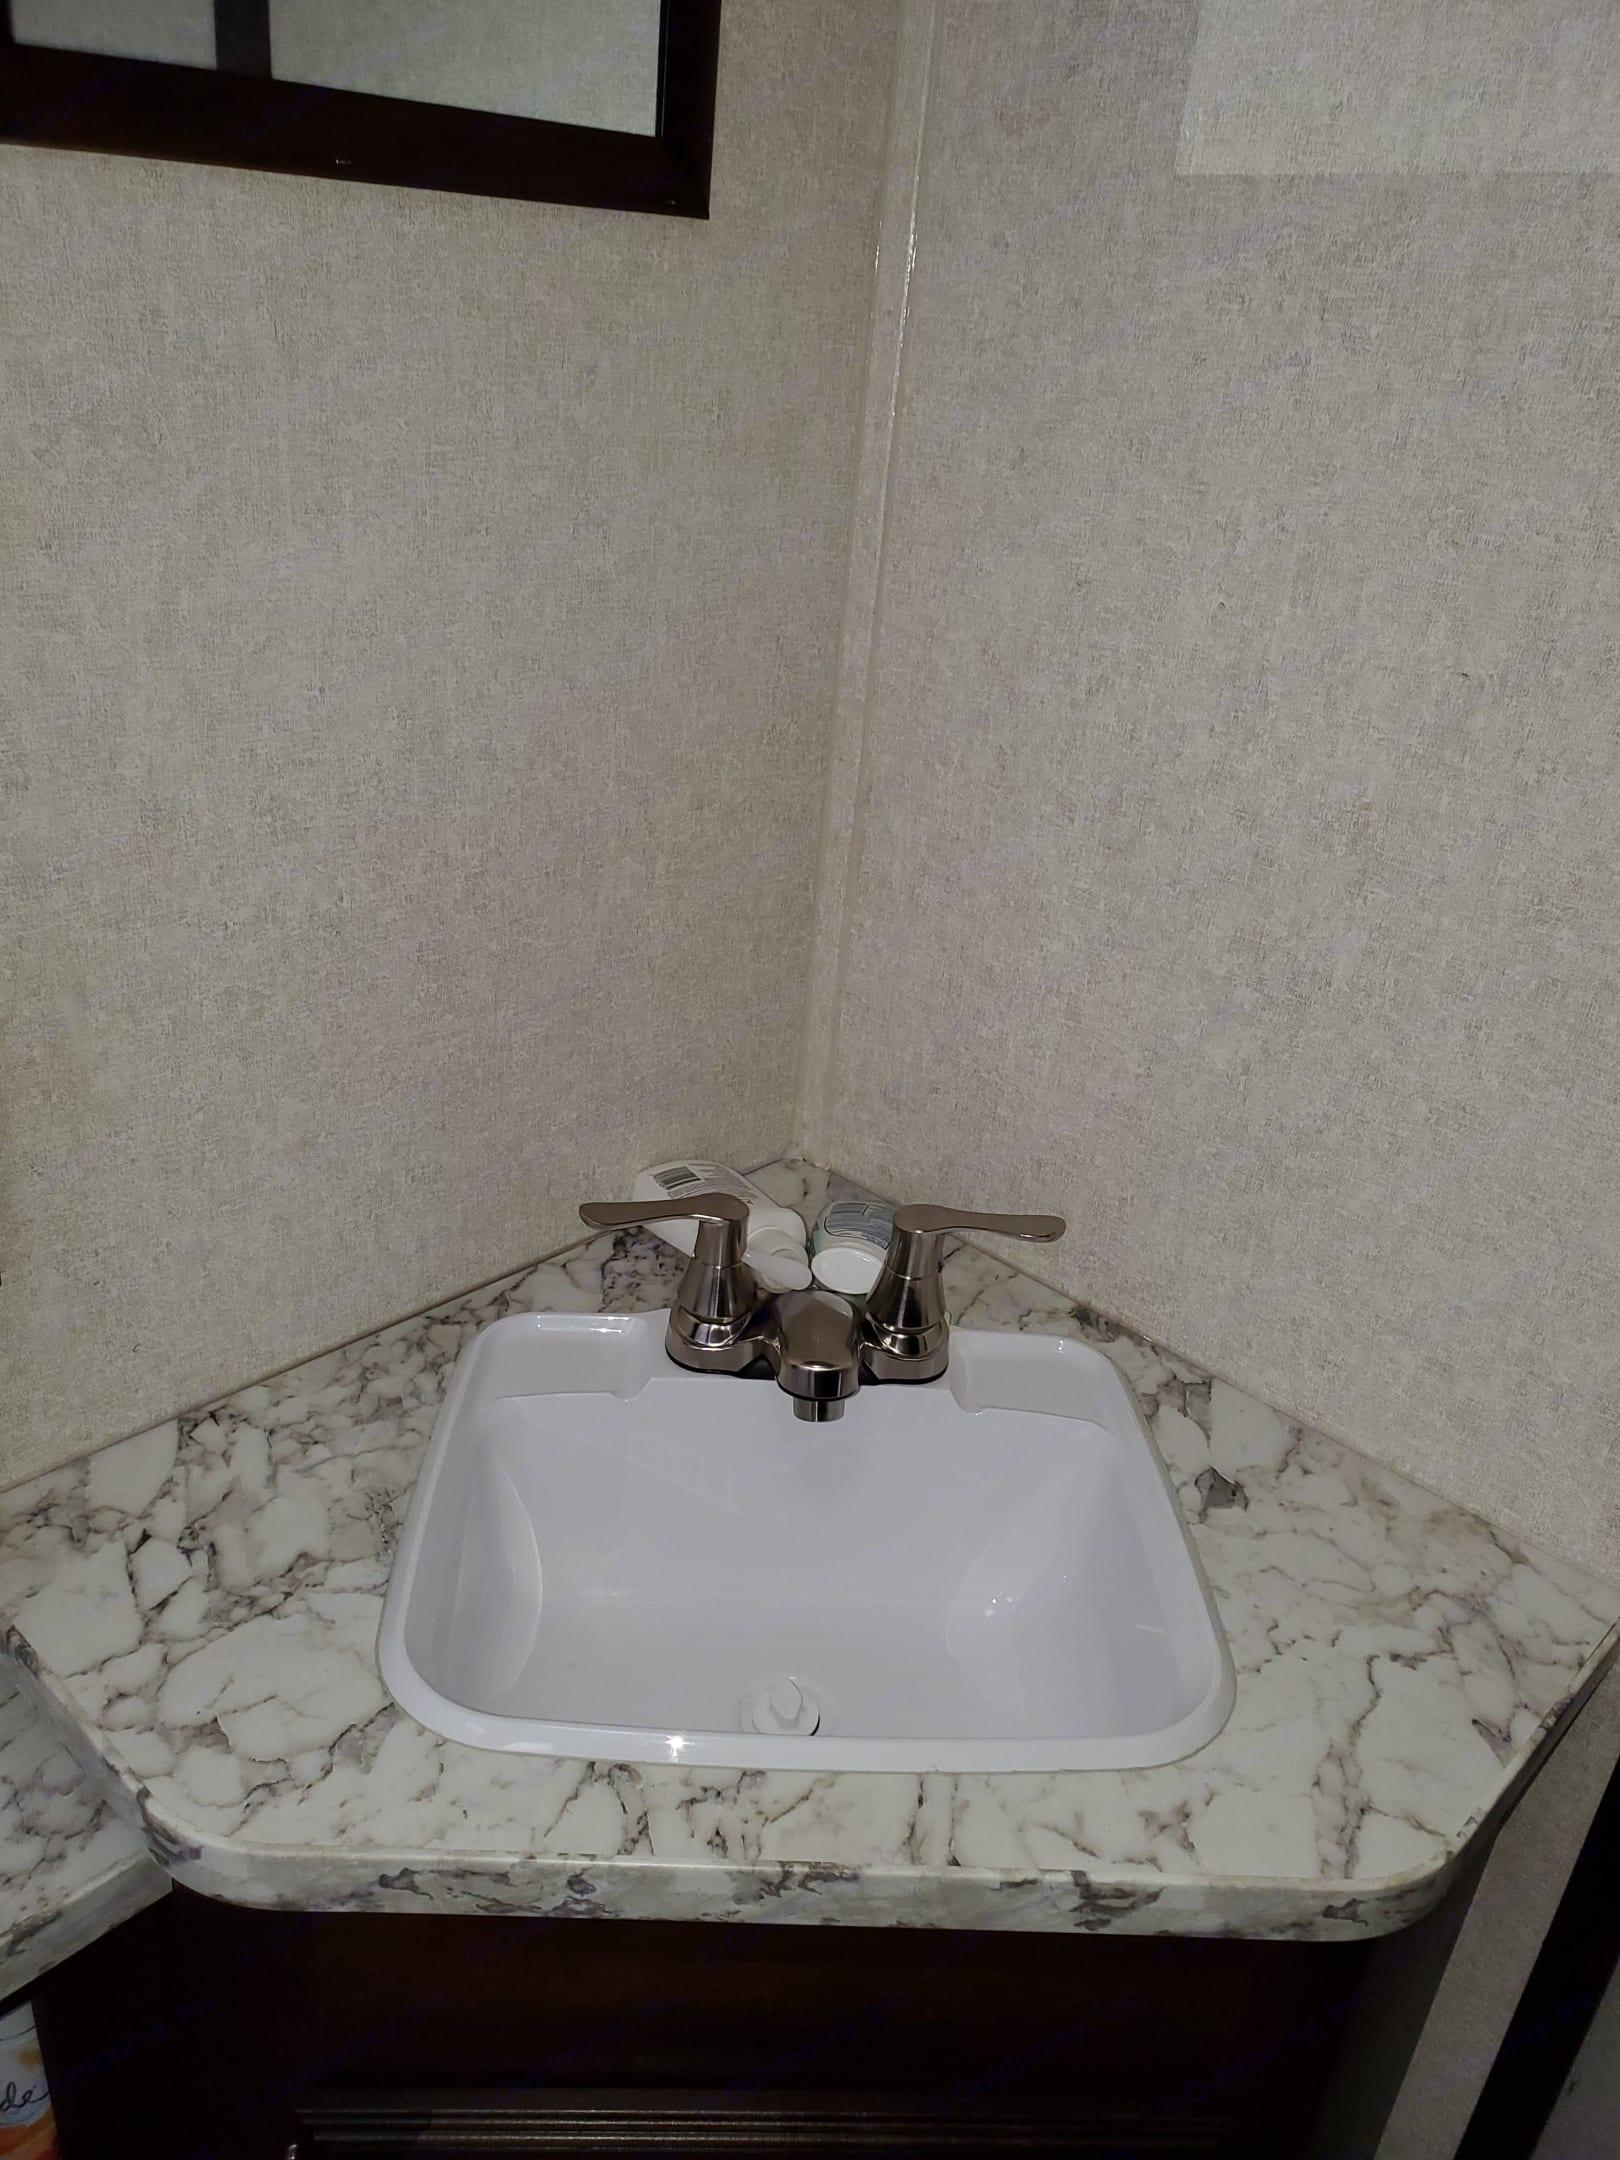 Sink in bathroom. Jayco Jay Flight 2019